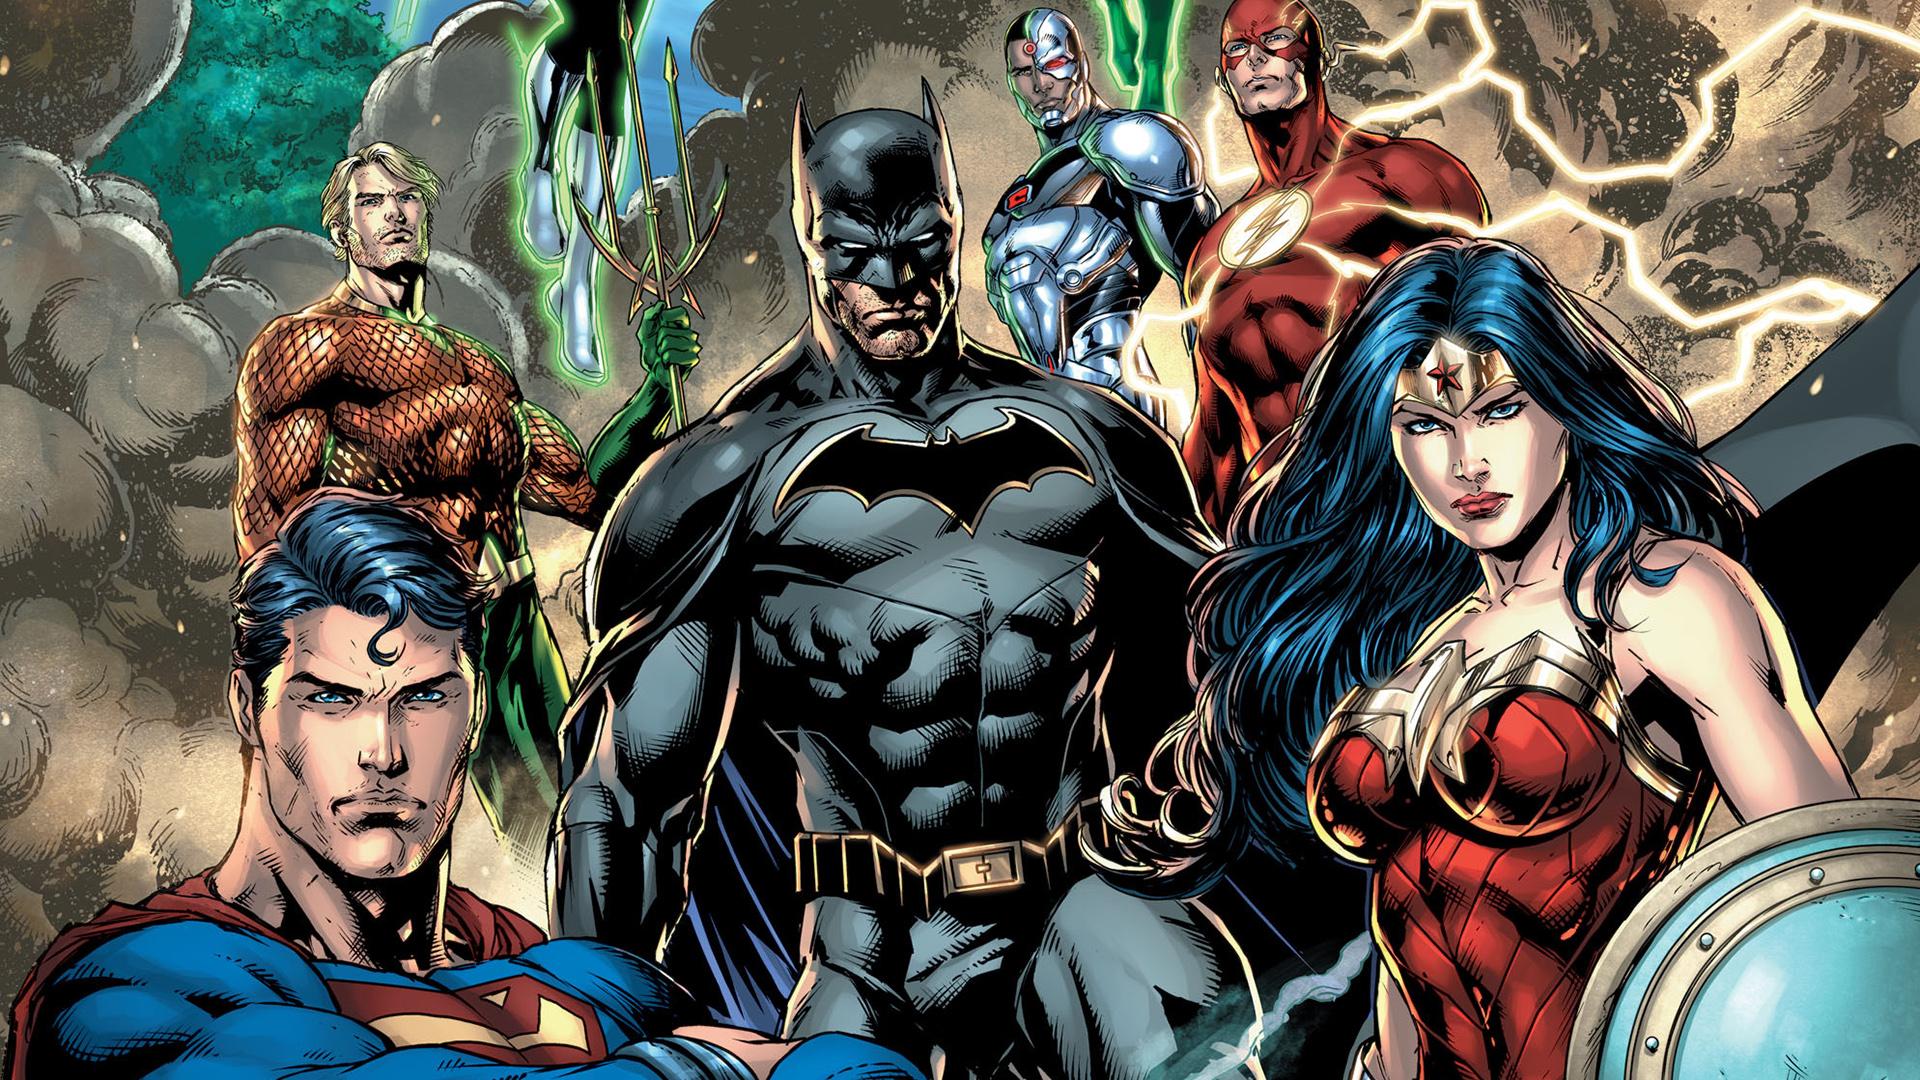 Dc Comics Justice League : Justice league dc comic art resolution